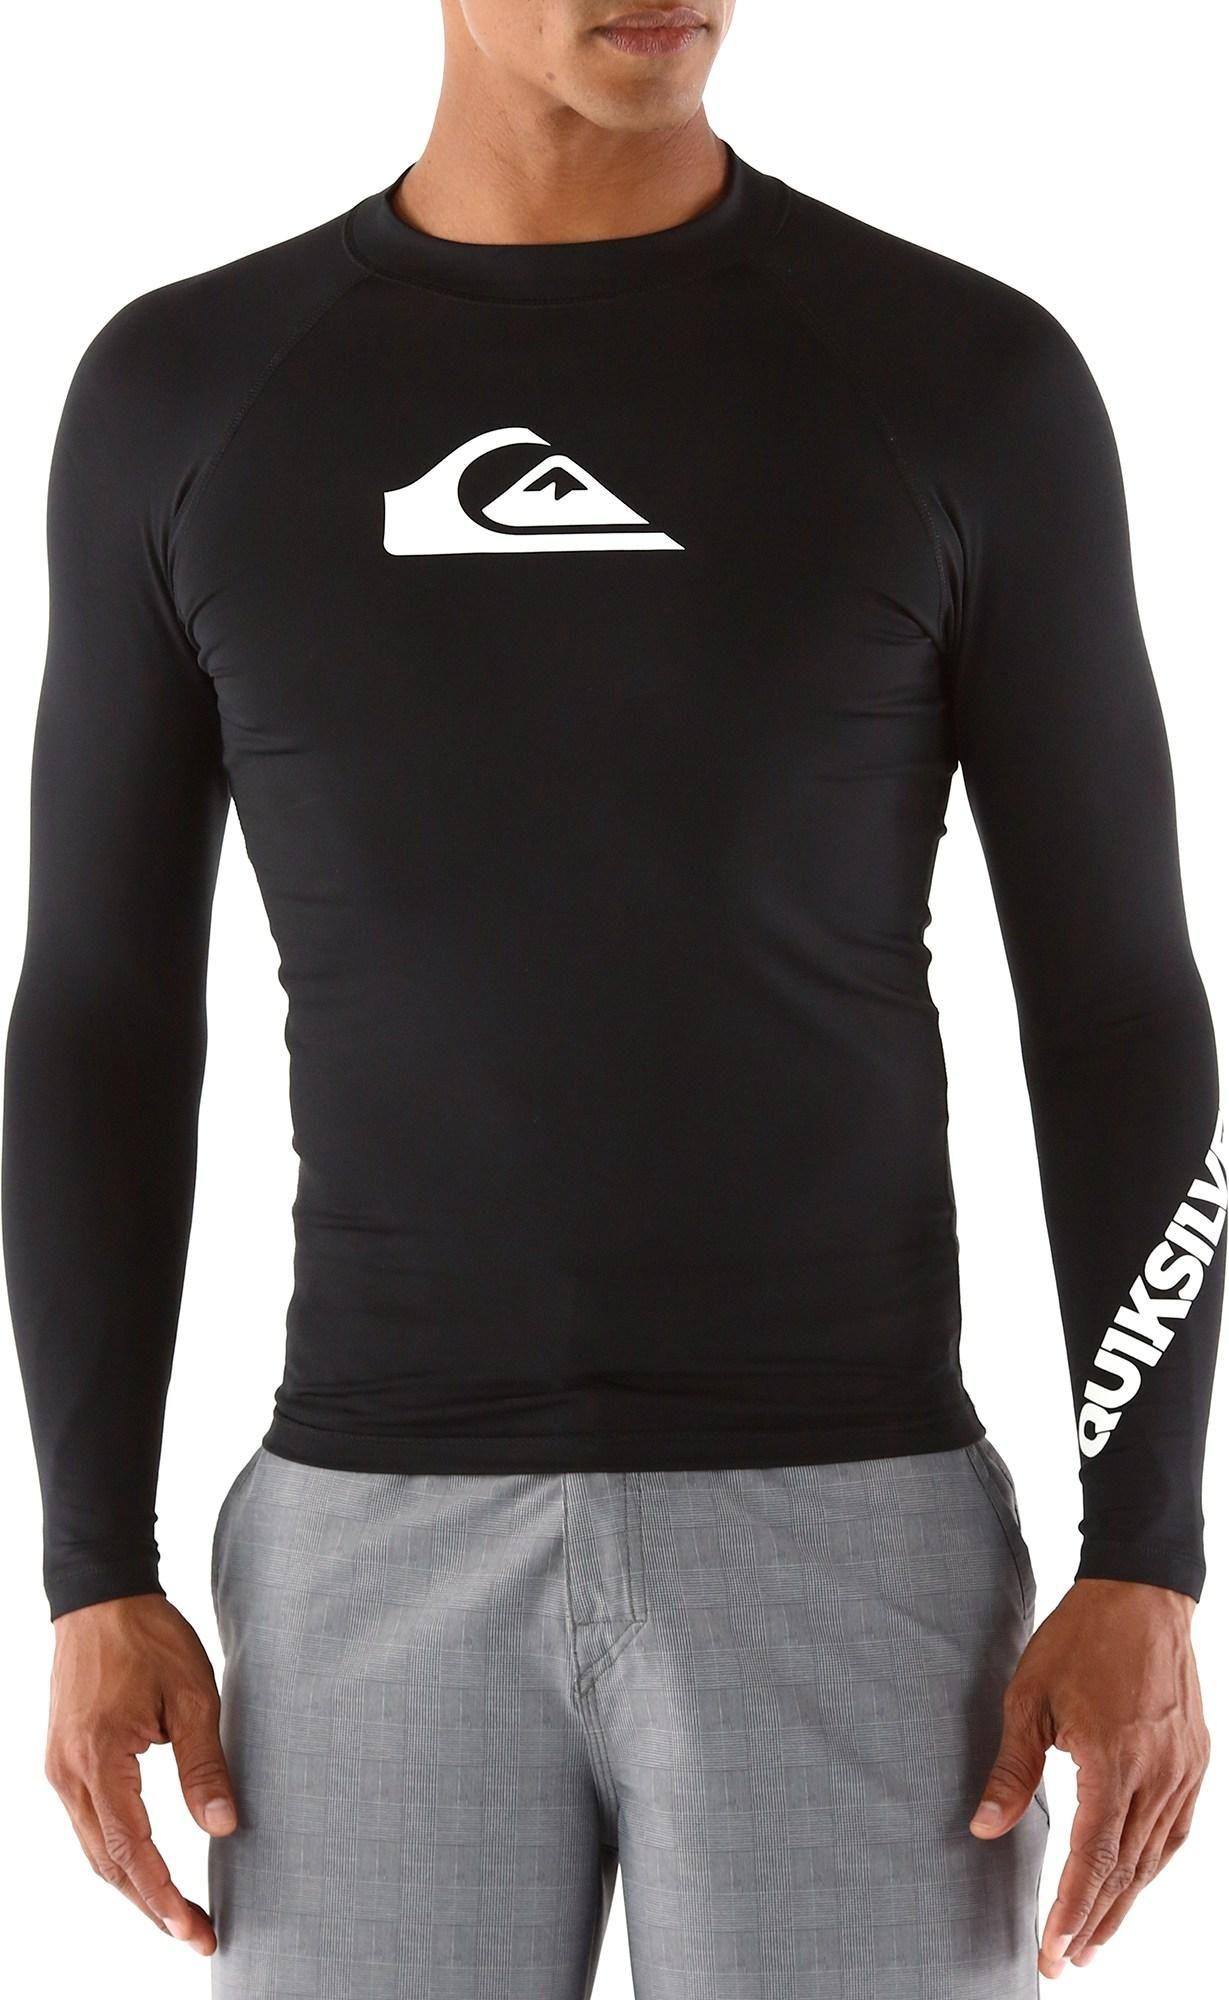 Quiksilver Mens Rash Guard Shirt